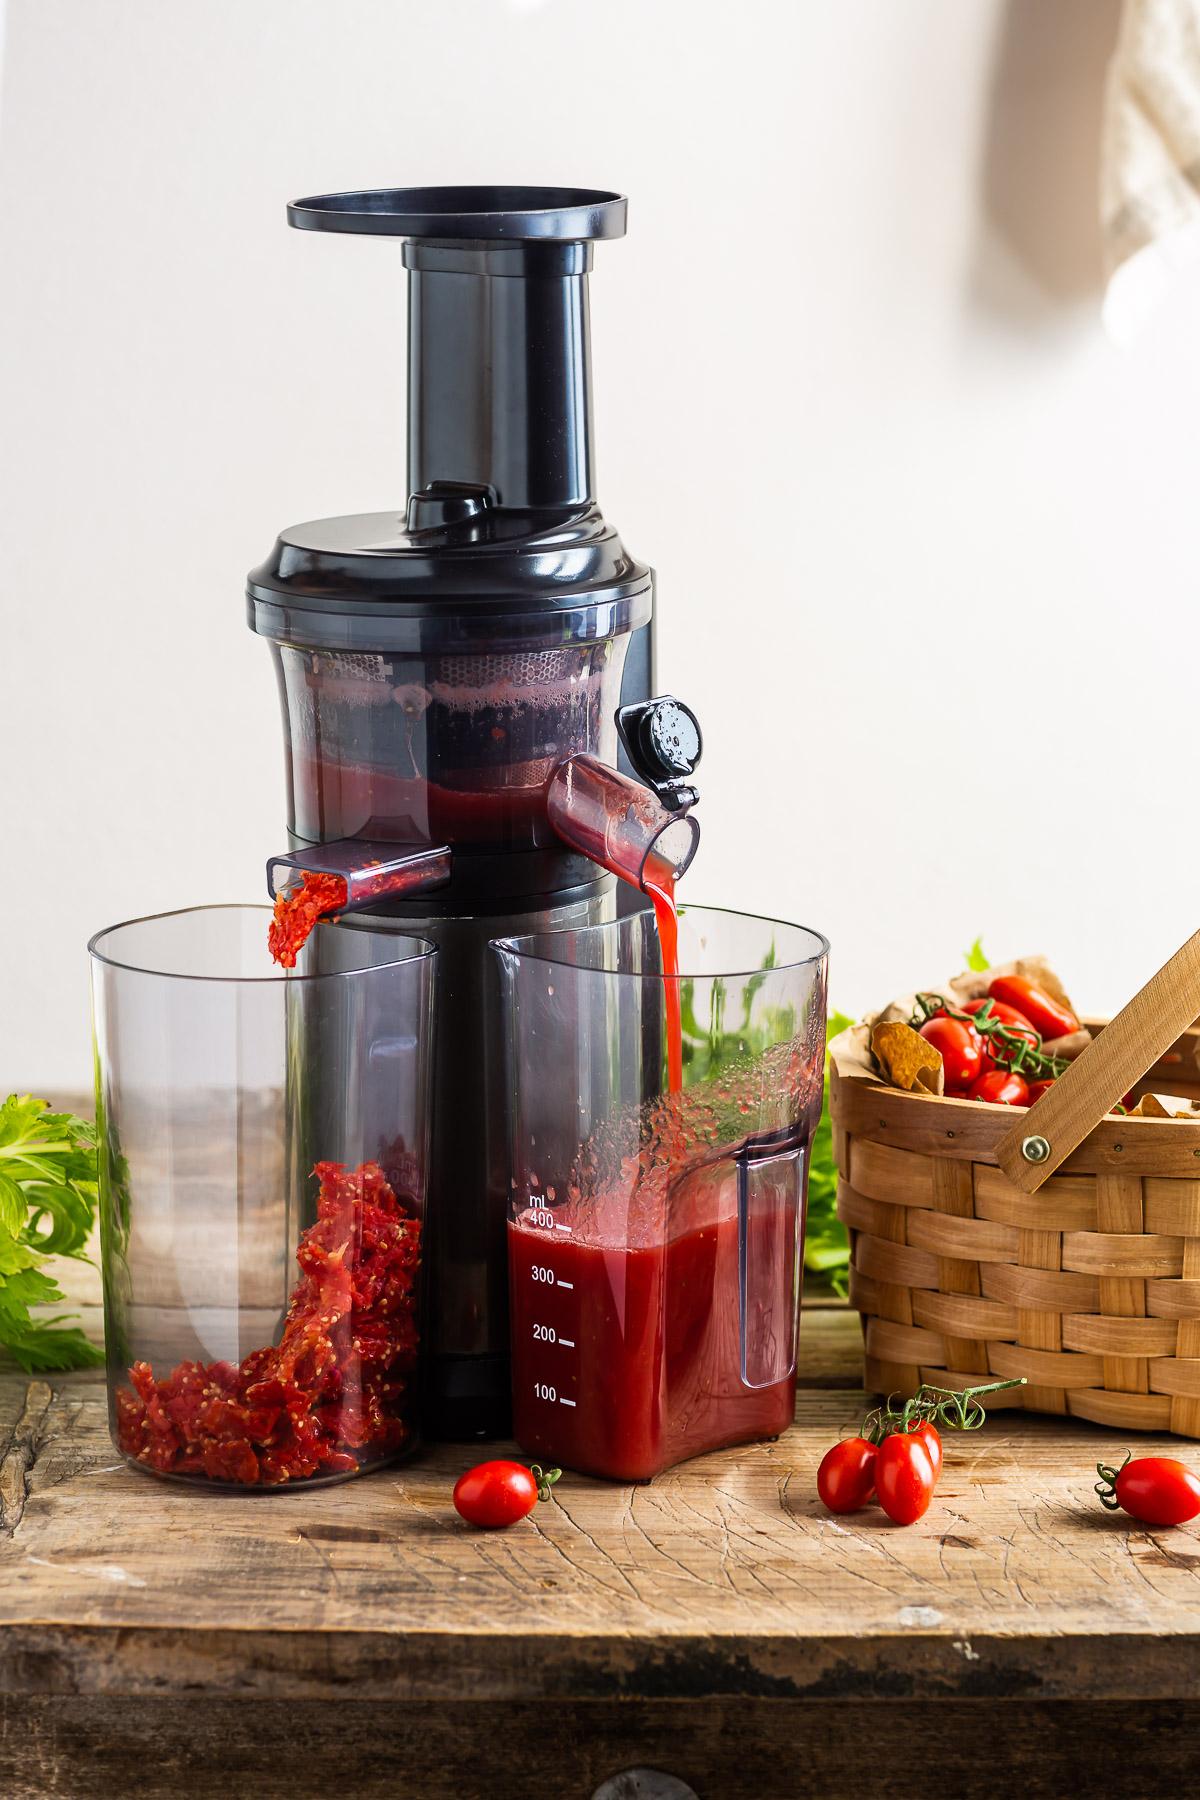 ricetta Bloody Mary Analcolico al Kefir d acqua per brunch e festa sano rinfrescante succo di pomodoro #healthy cocktail Vegan Water Kefir Virgin Mary recipe #cocktail